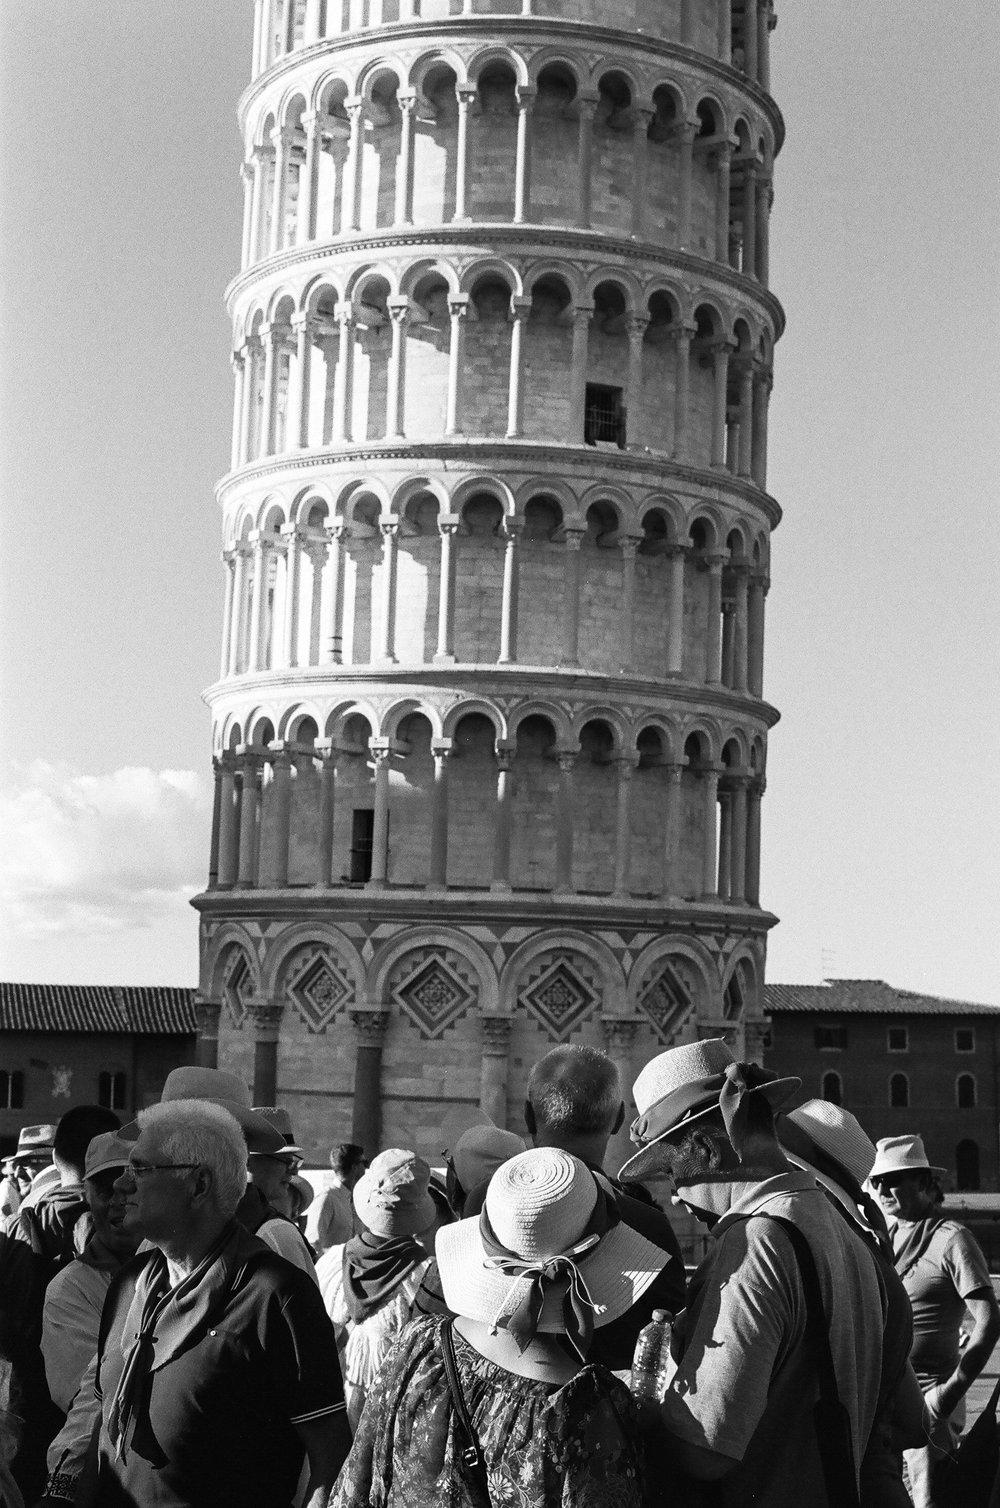 Pisa - Clifford Darby 2018